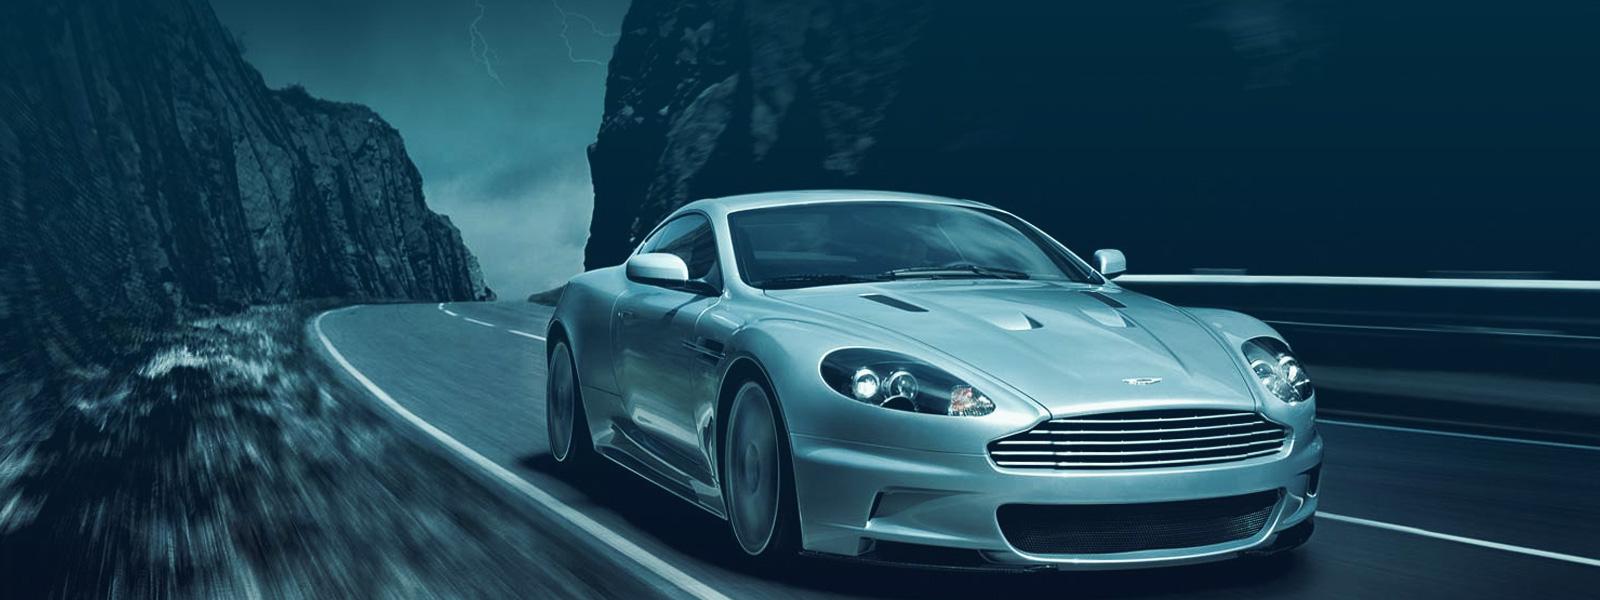 blog-ceabs-aston-martin-vanquish-coupe-velocidade-luxo-quatro-rodas